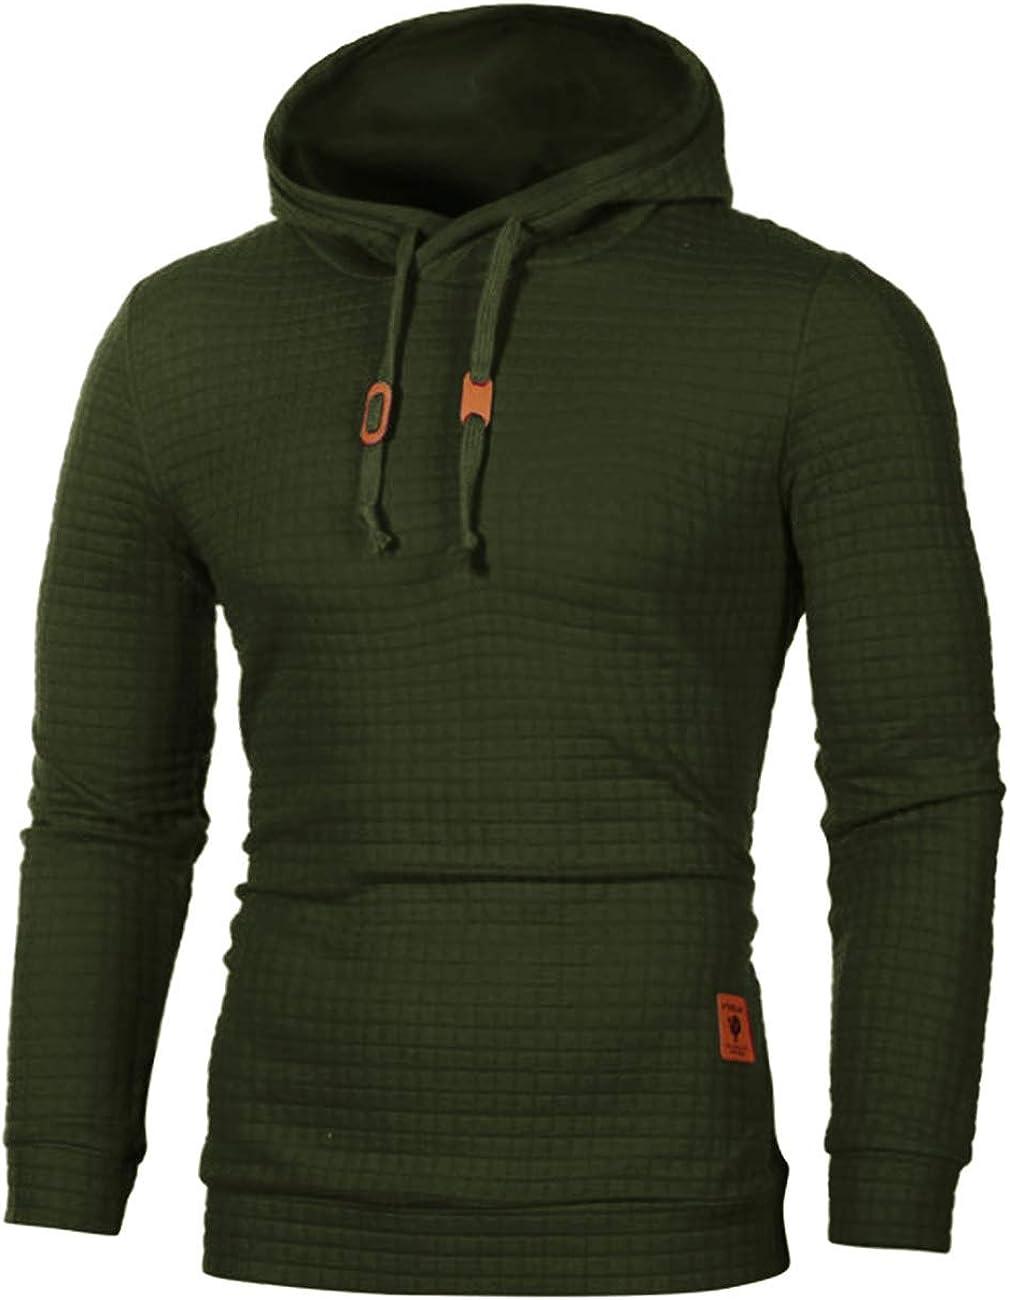 Sexyshine Mens Casual Long Sleeve Plaid Jacquard Pullover Hooded Sweatshirt